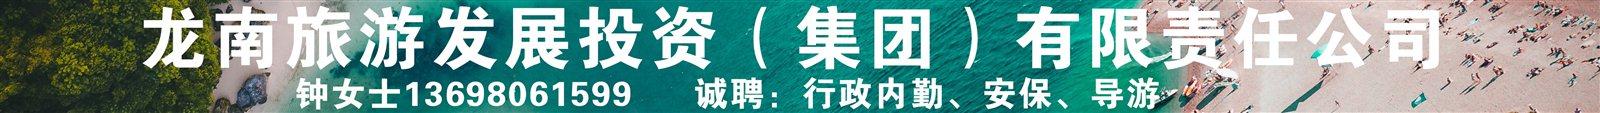 ��南旅游�l展投�Y(集�F)有限�任公司